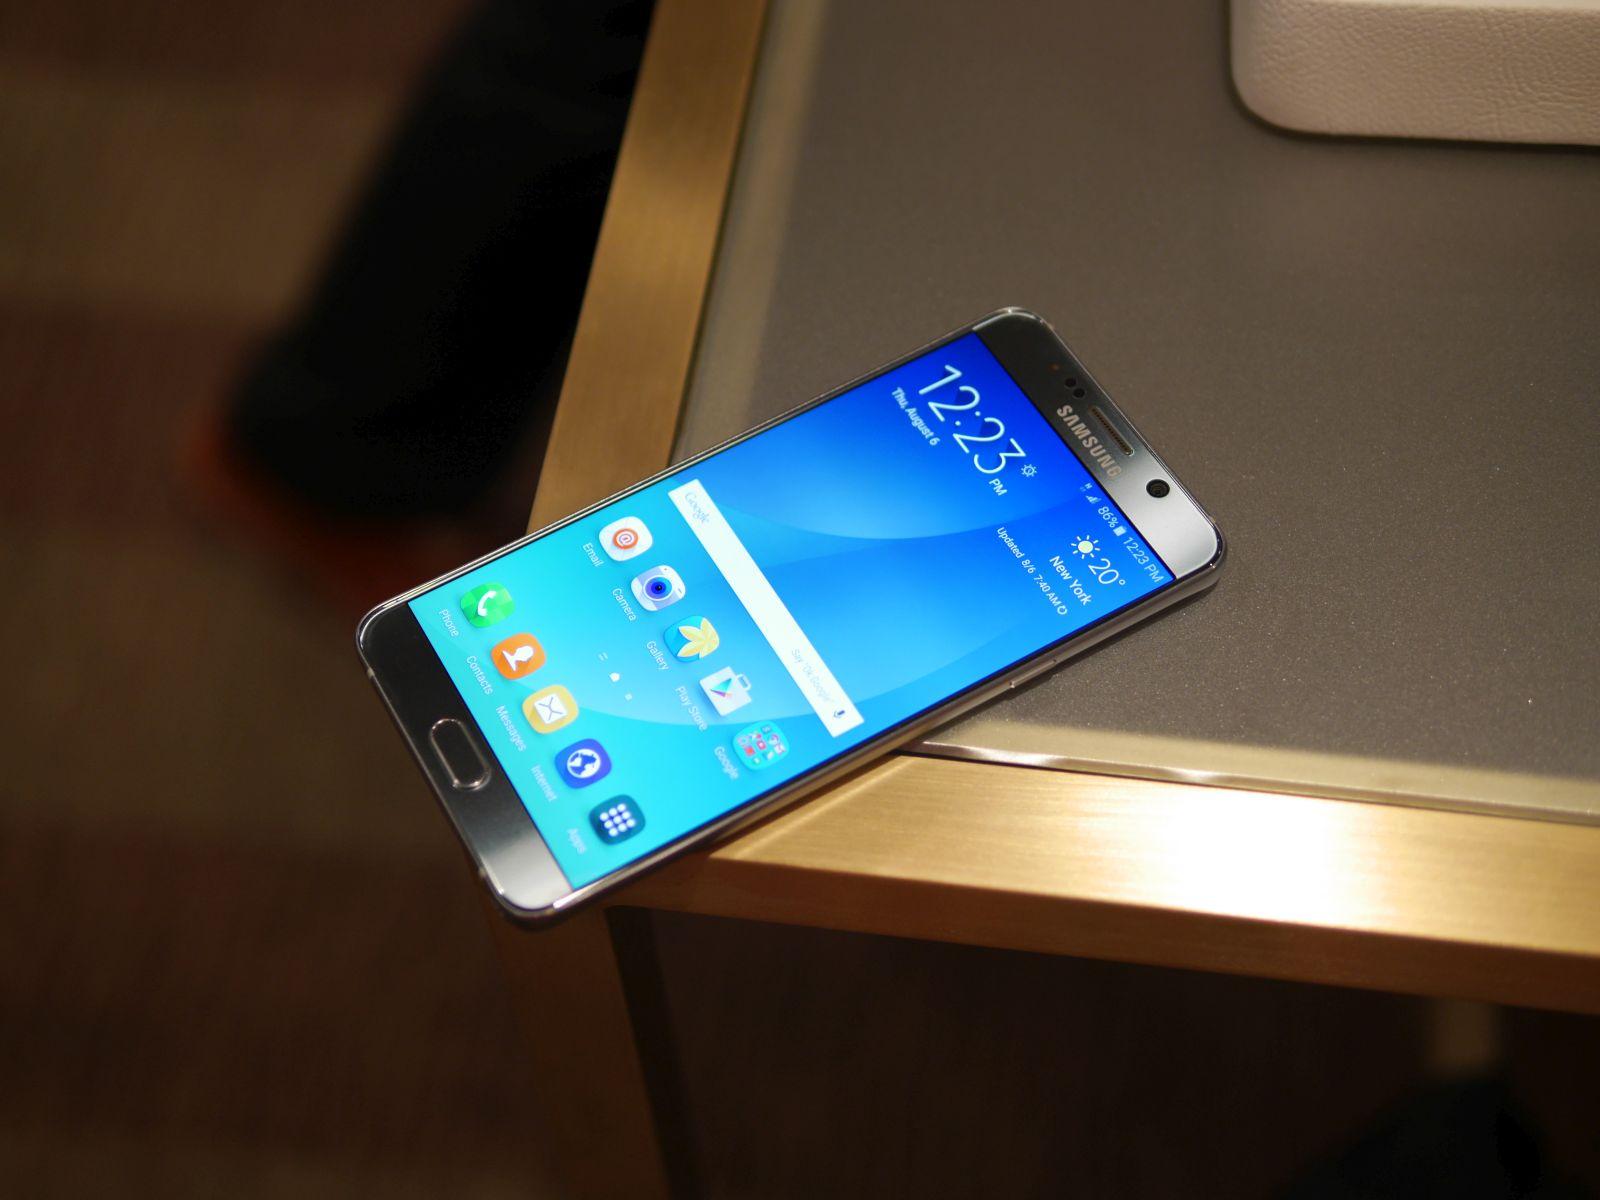 Samsung Galaxy S6 edge Plus 16